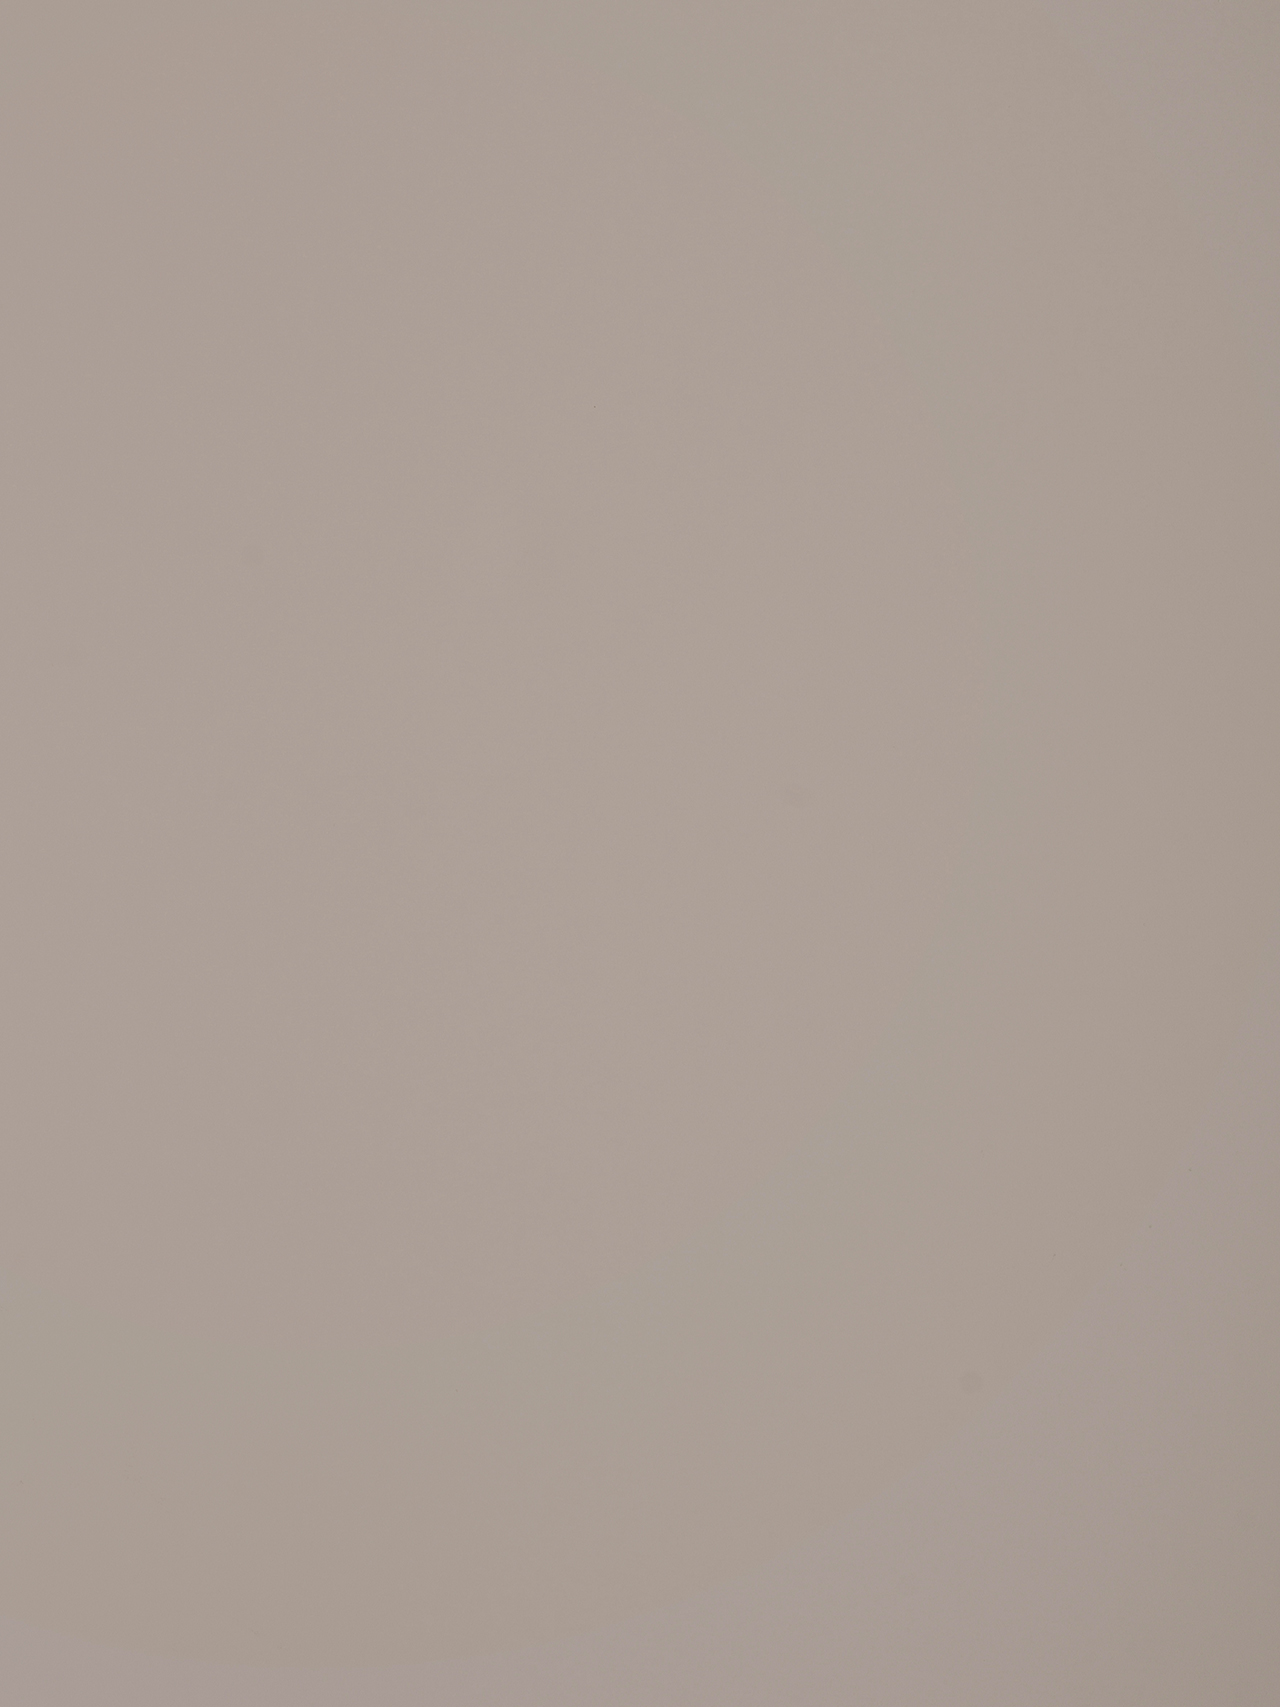 МДФ HM01/UA92 19мм Piombo/Seta 3050х1300мм